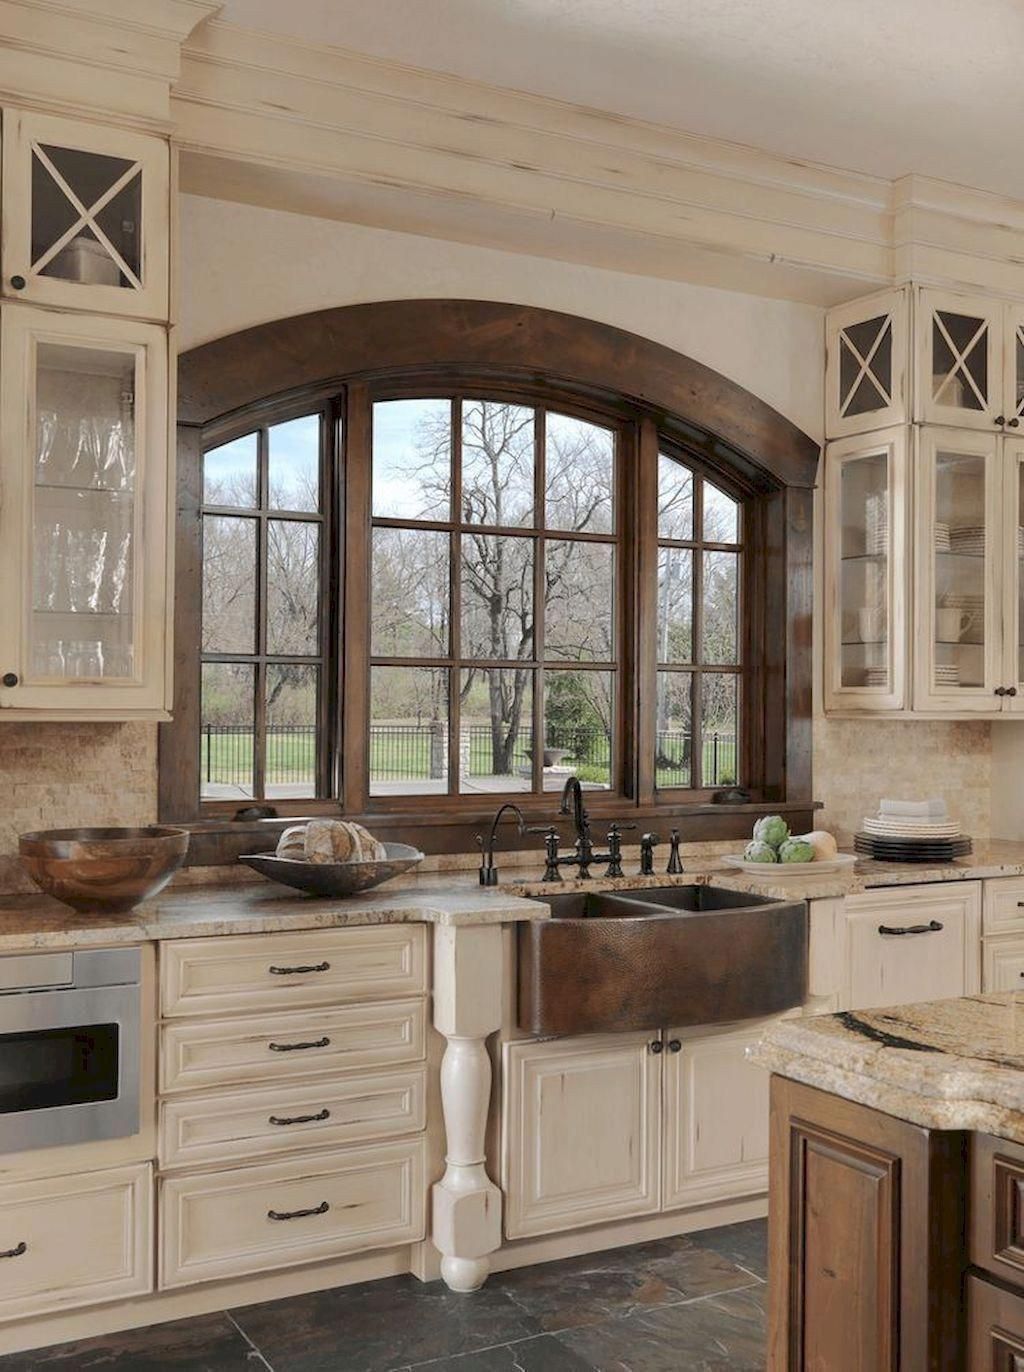 best modern farmhouse kitchen for your house design 34 gurudecor com farmhousehomedecoration on farmhouse kitchen maple cabinets id=88846